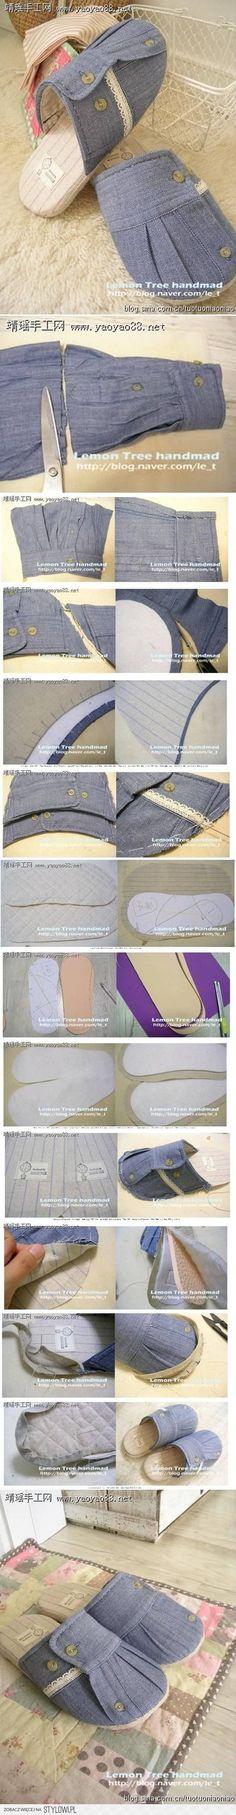 DIY Old Clothes Cuff Slipper DIY Projects | UsefulDIY.c… na Stylowi.pl